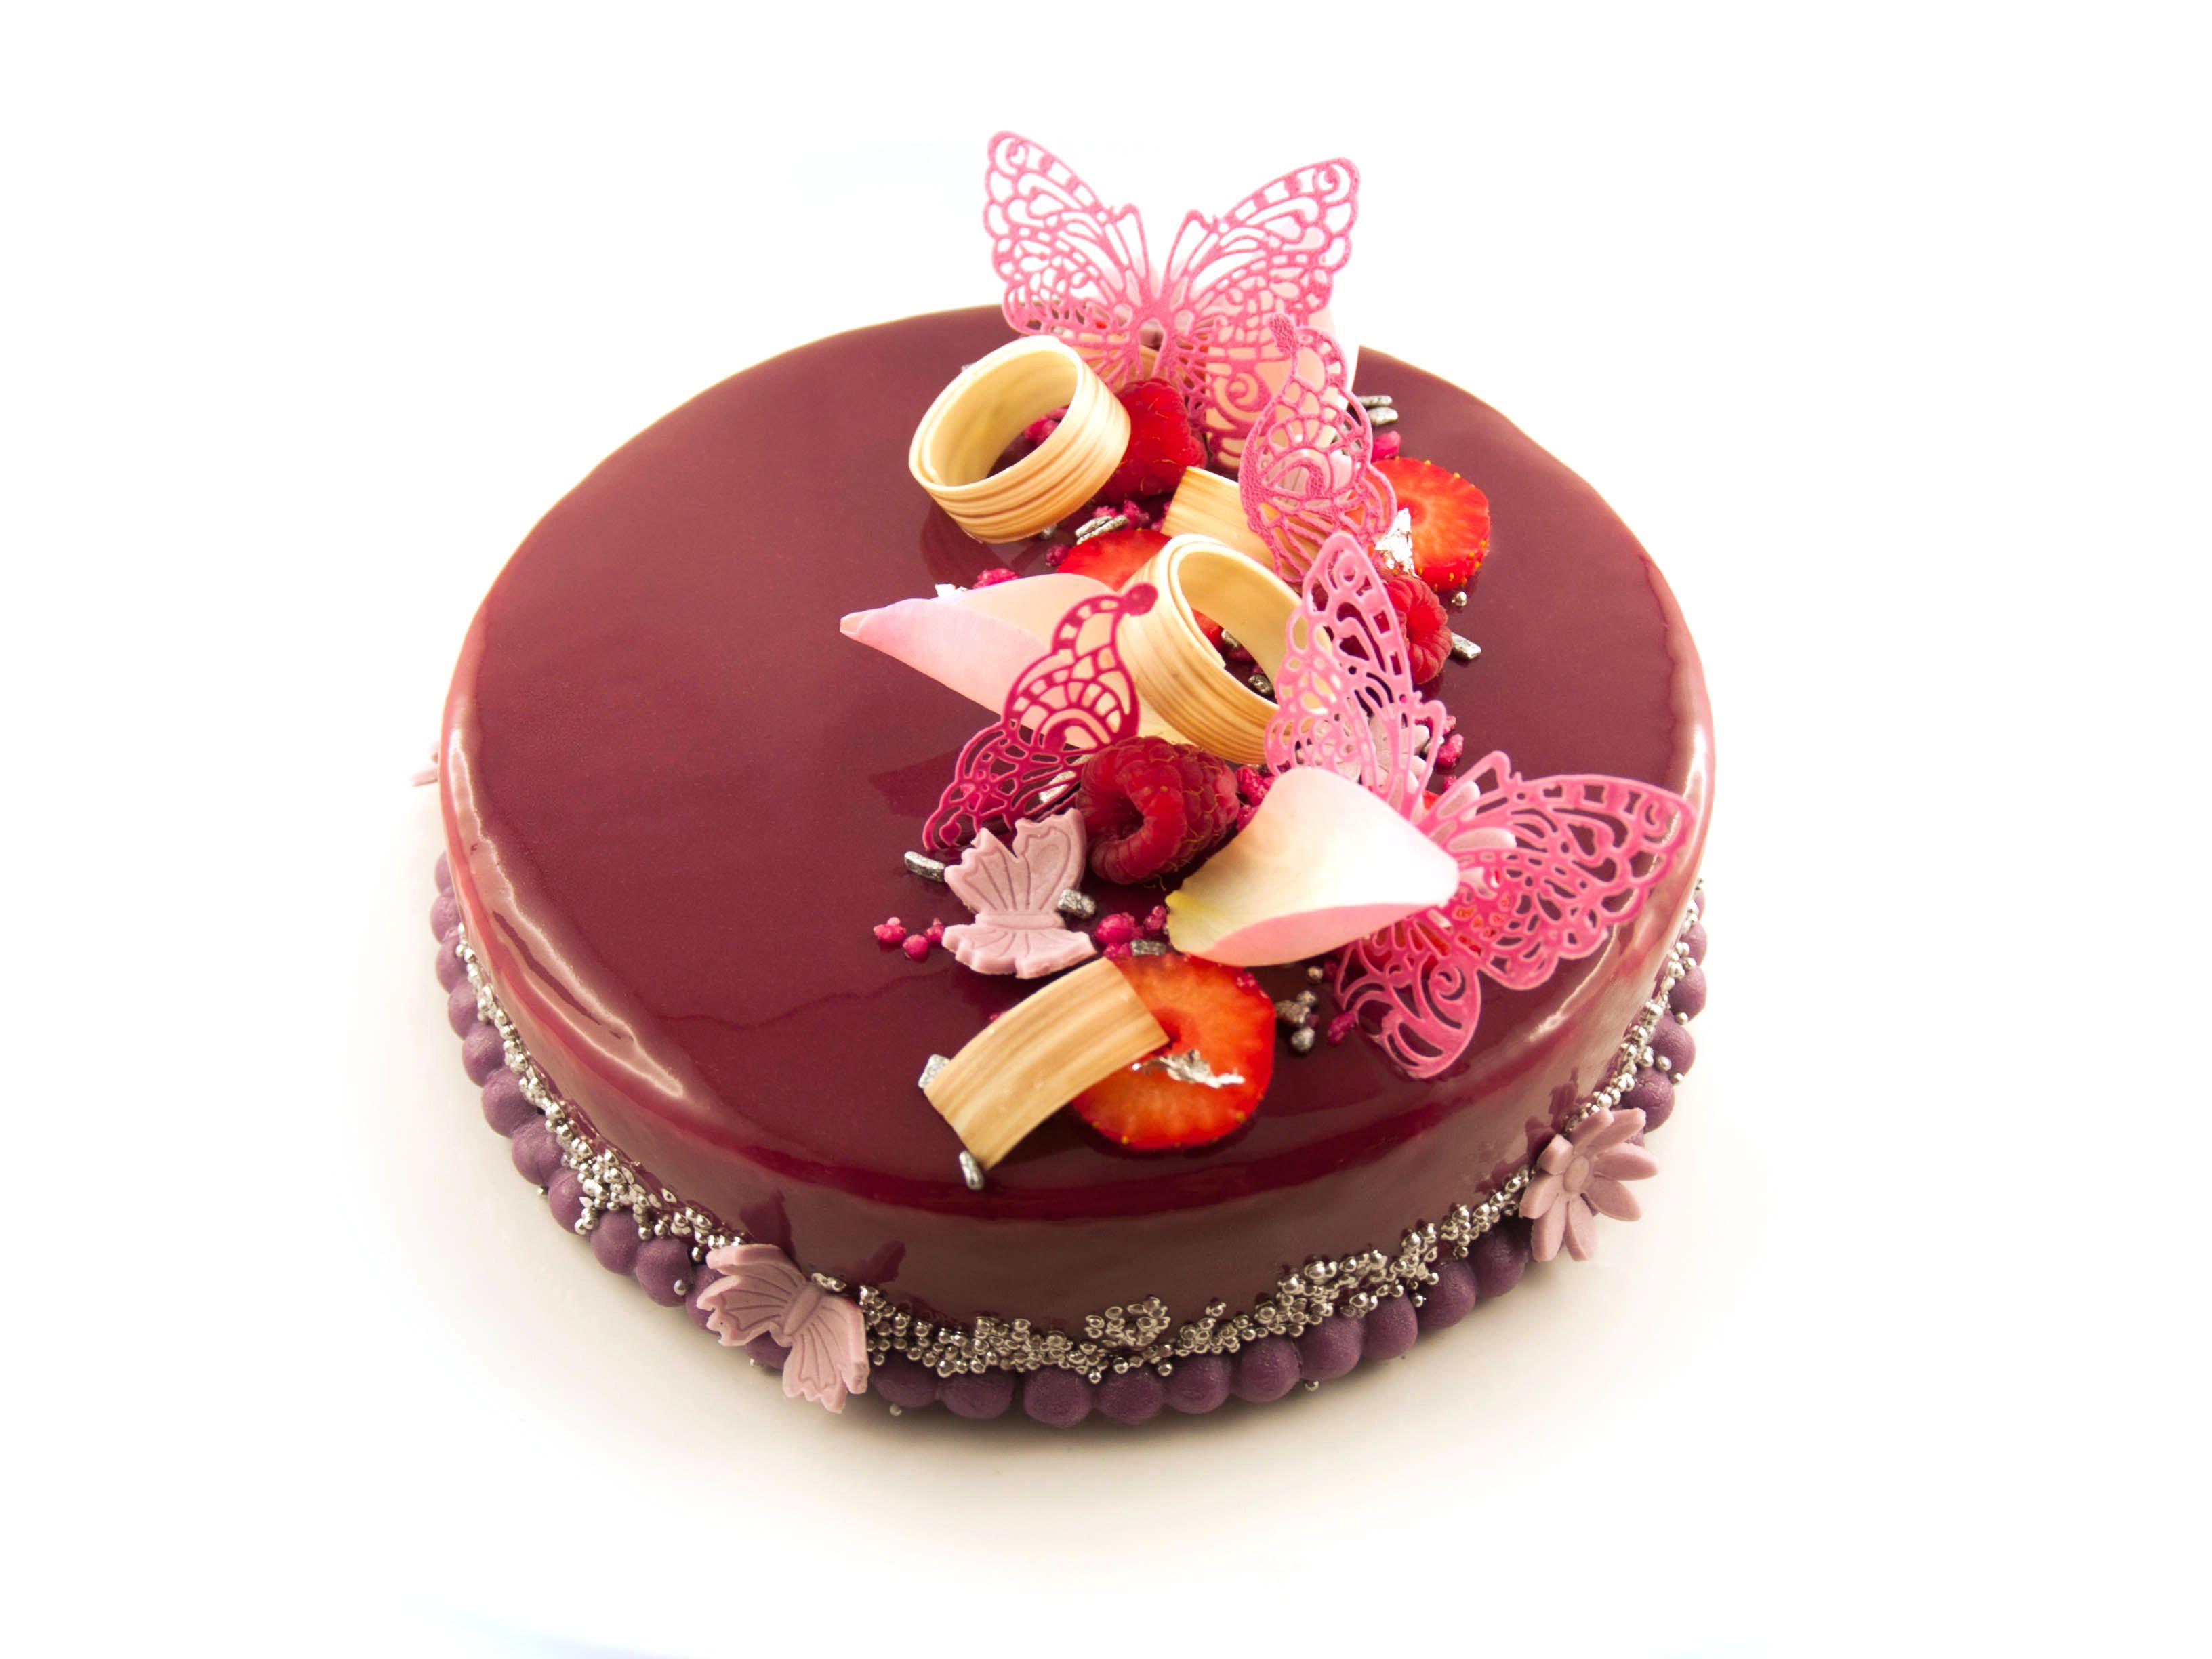 biscuit framboise confit fraises framboises biscuit macaron cr meux fruits rouge mousse. Black Bedroom Furniture Sets. Home Design Ideas